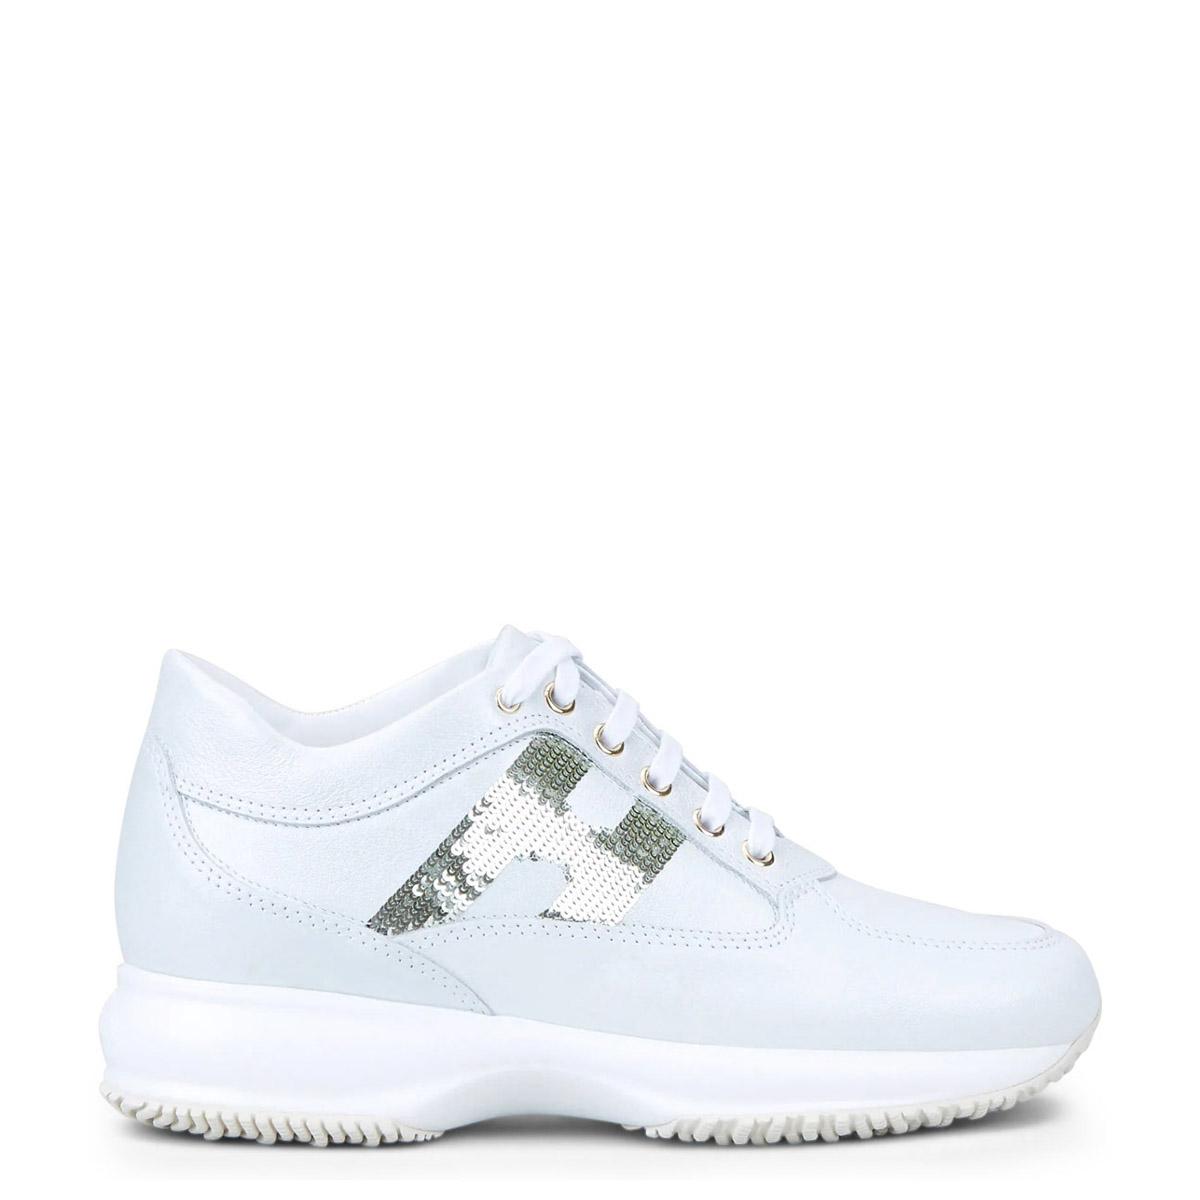 Sneakers γυναικεία Hogan Λευκό Interactve